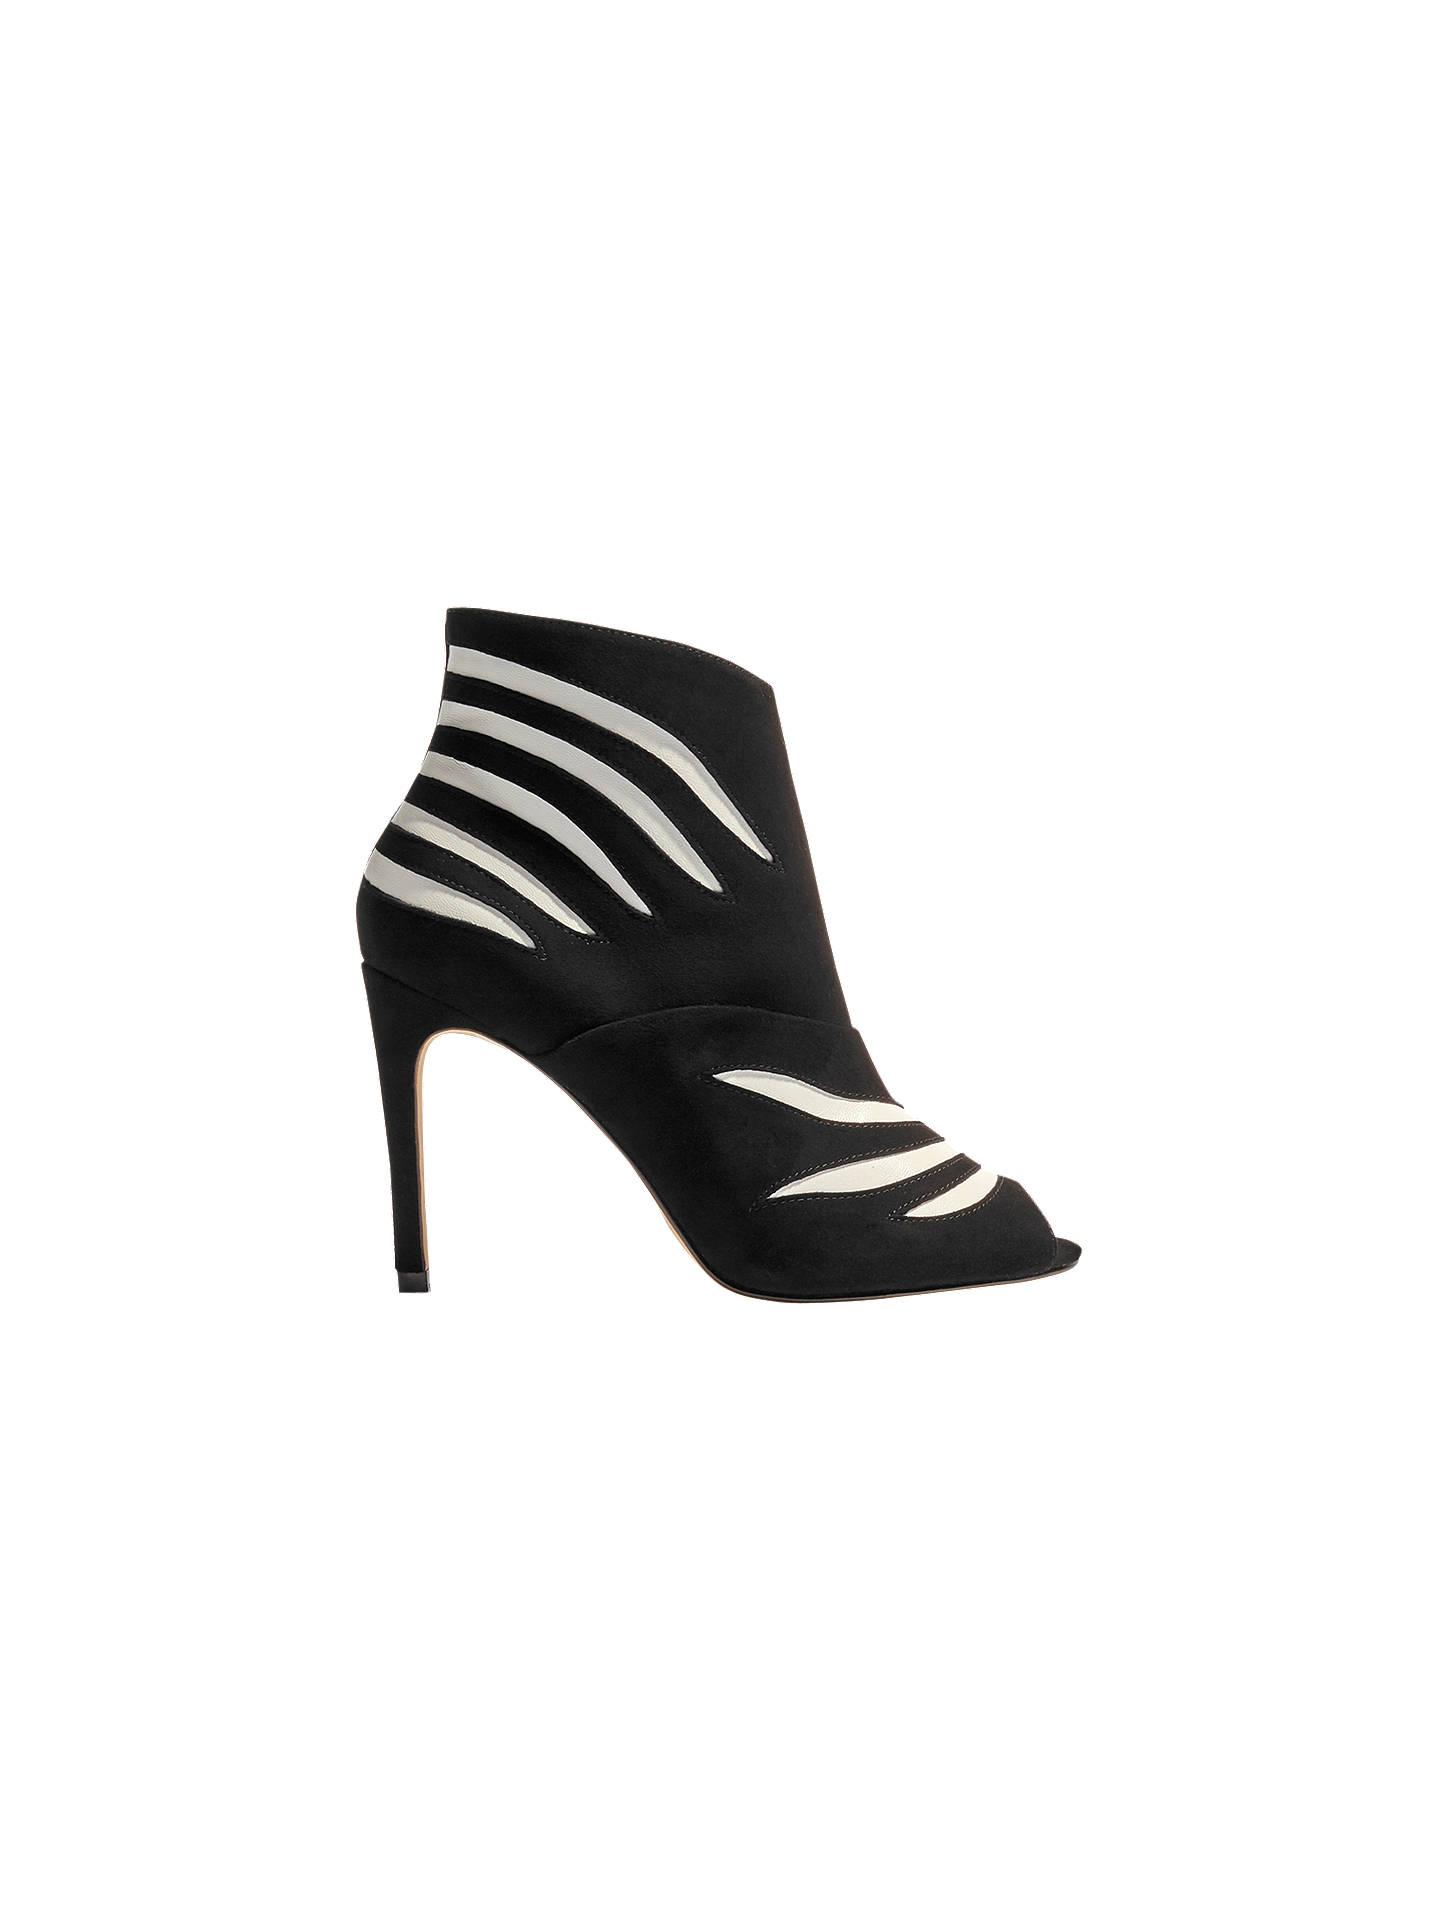 ab630f50e15f Buy Karen Millen Striped Stiletto Heeled Shoe Boots